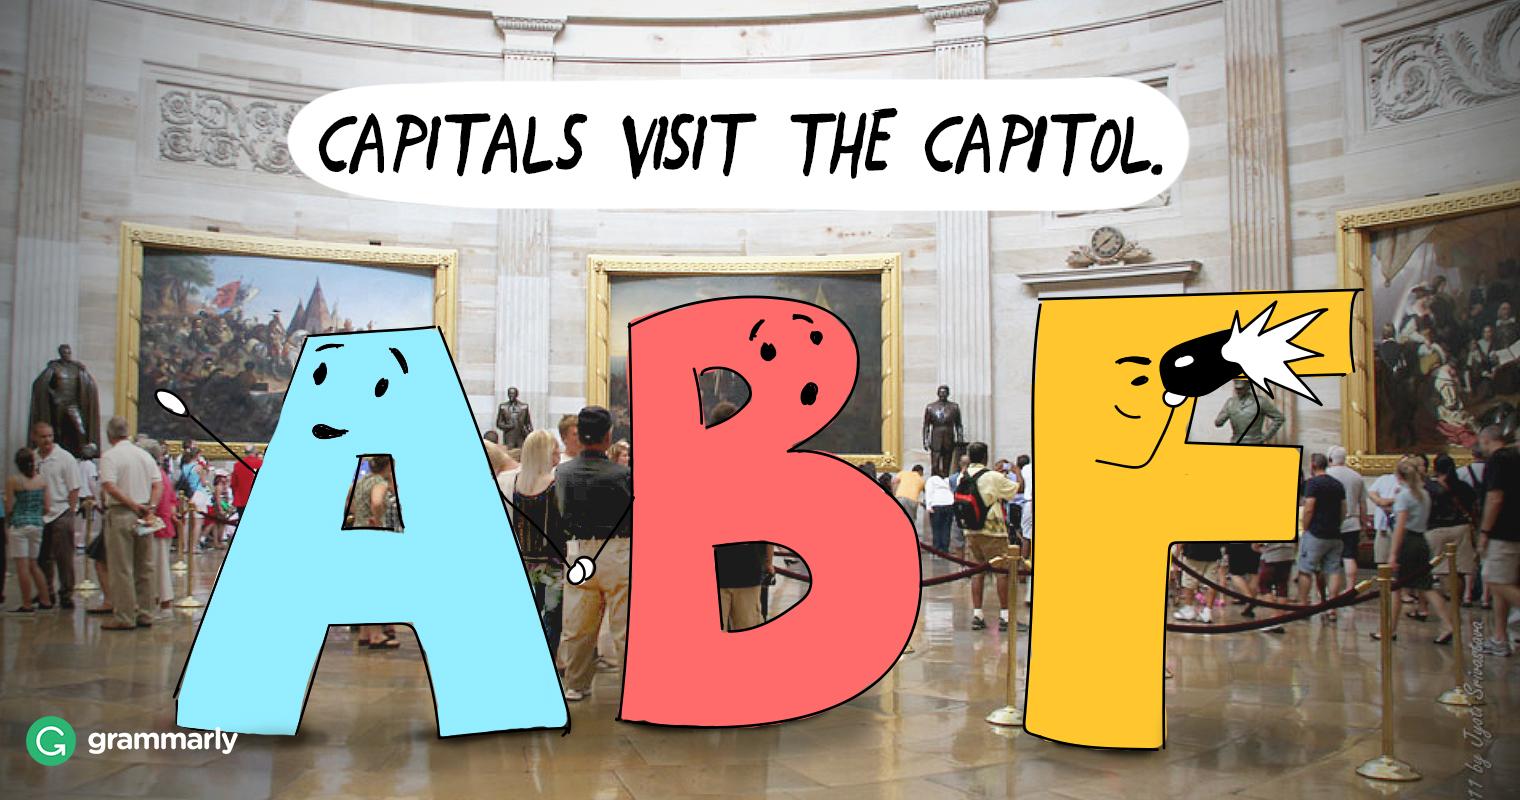 Capital vs. Capitol image